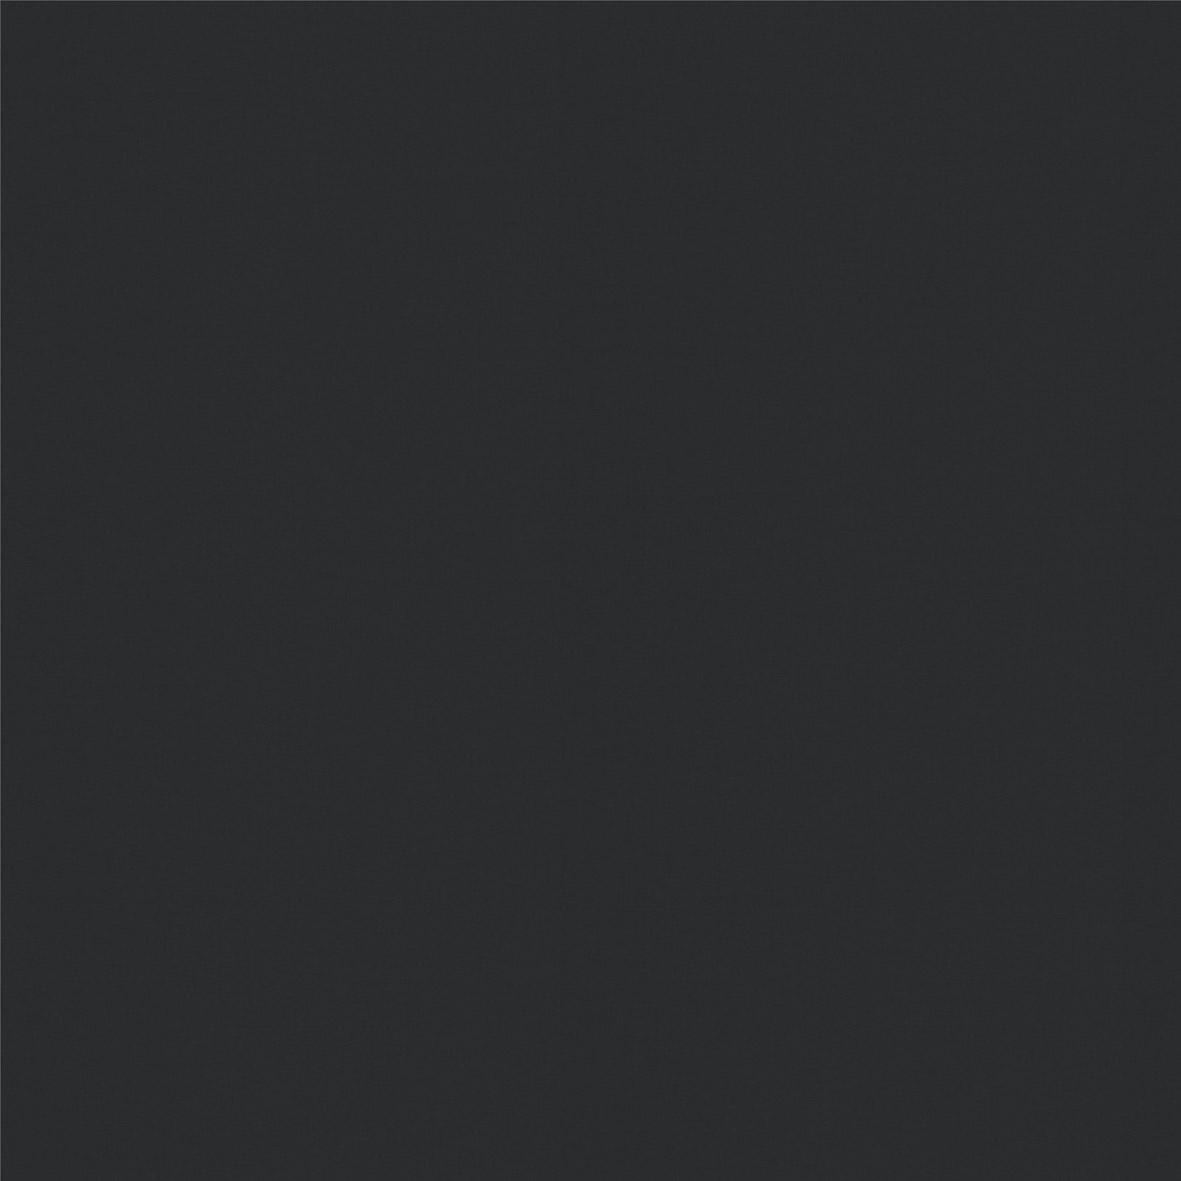 Roller_Swatch_Banlight_Duo_FR_Black_RE0313